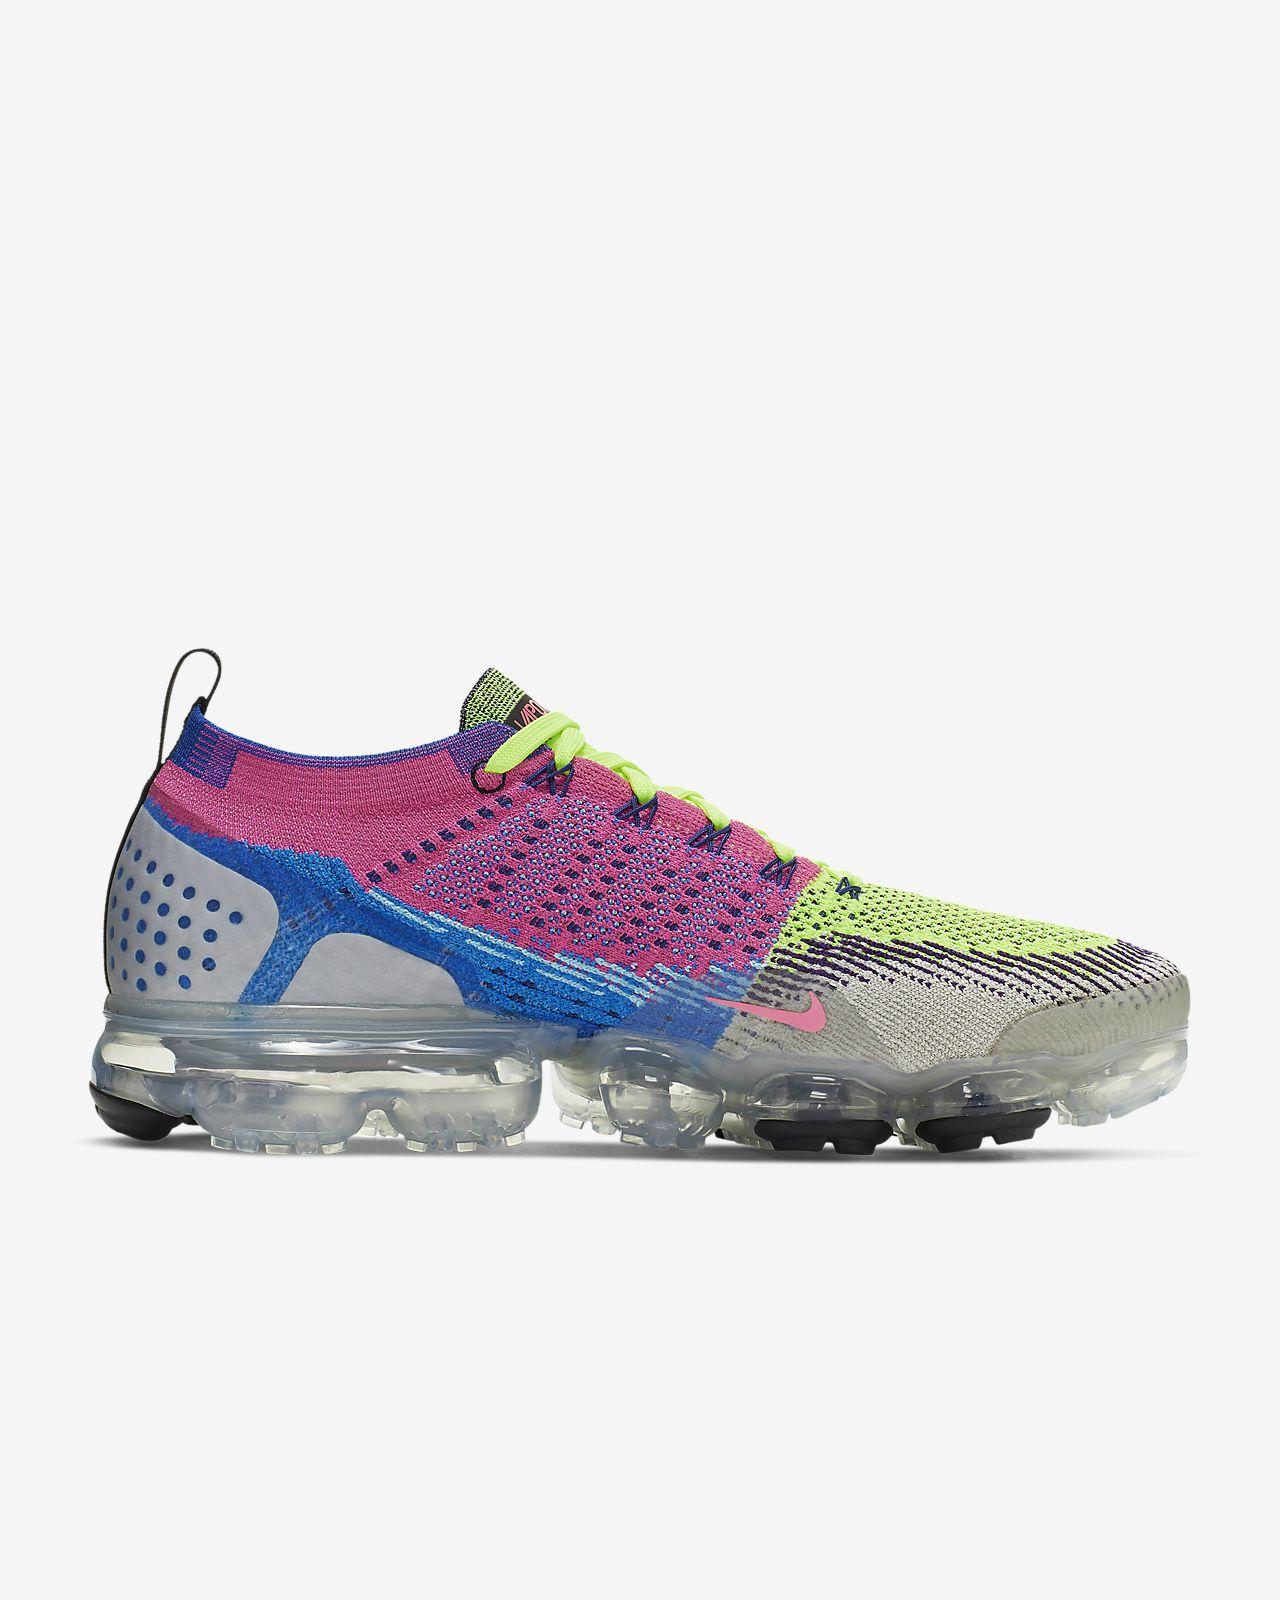 online store 7e7a0 31603 ... Nike Air VaporMax Flyknit 2 Random Men s Shoe